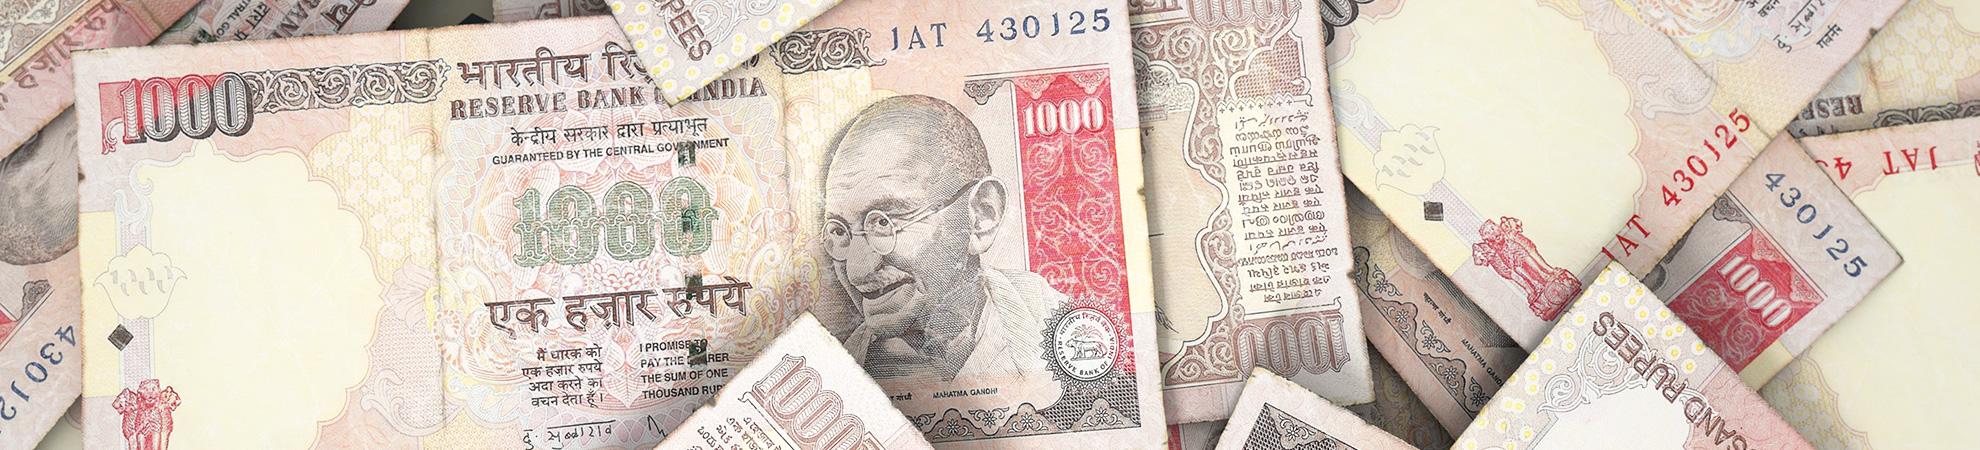 Monnaie en Inde